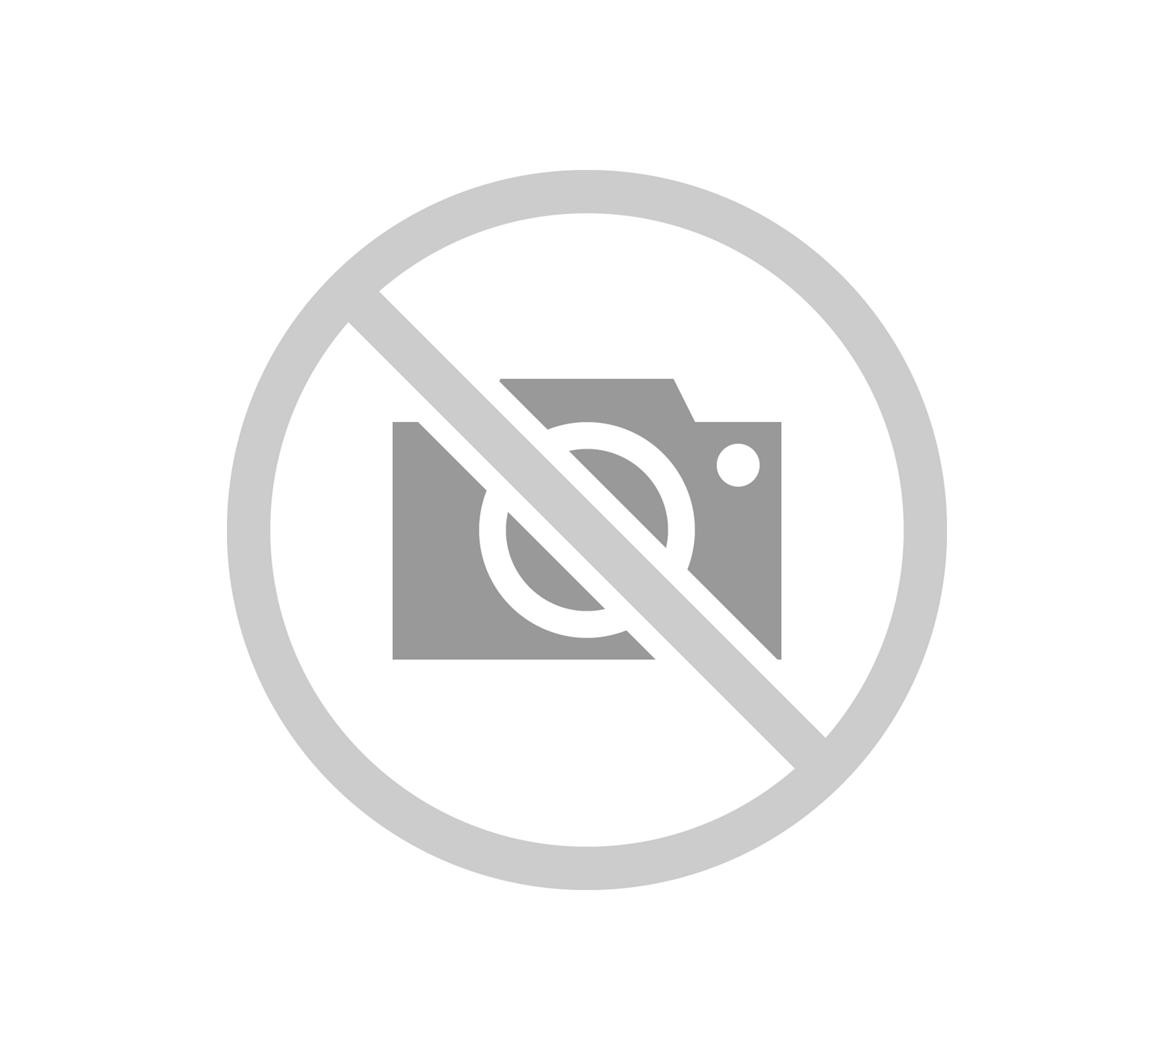 Sedací souprava WAIKIKI 2.5F+ROH+2 Primo 73 modrá